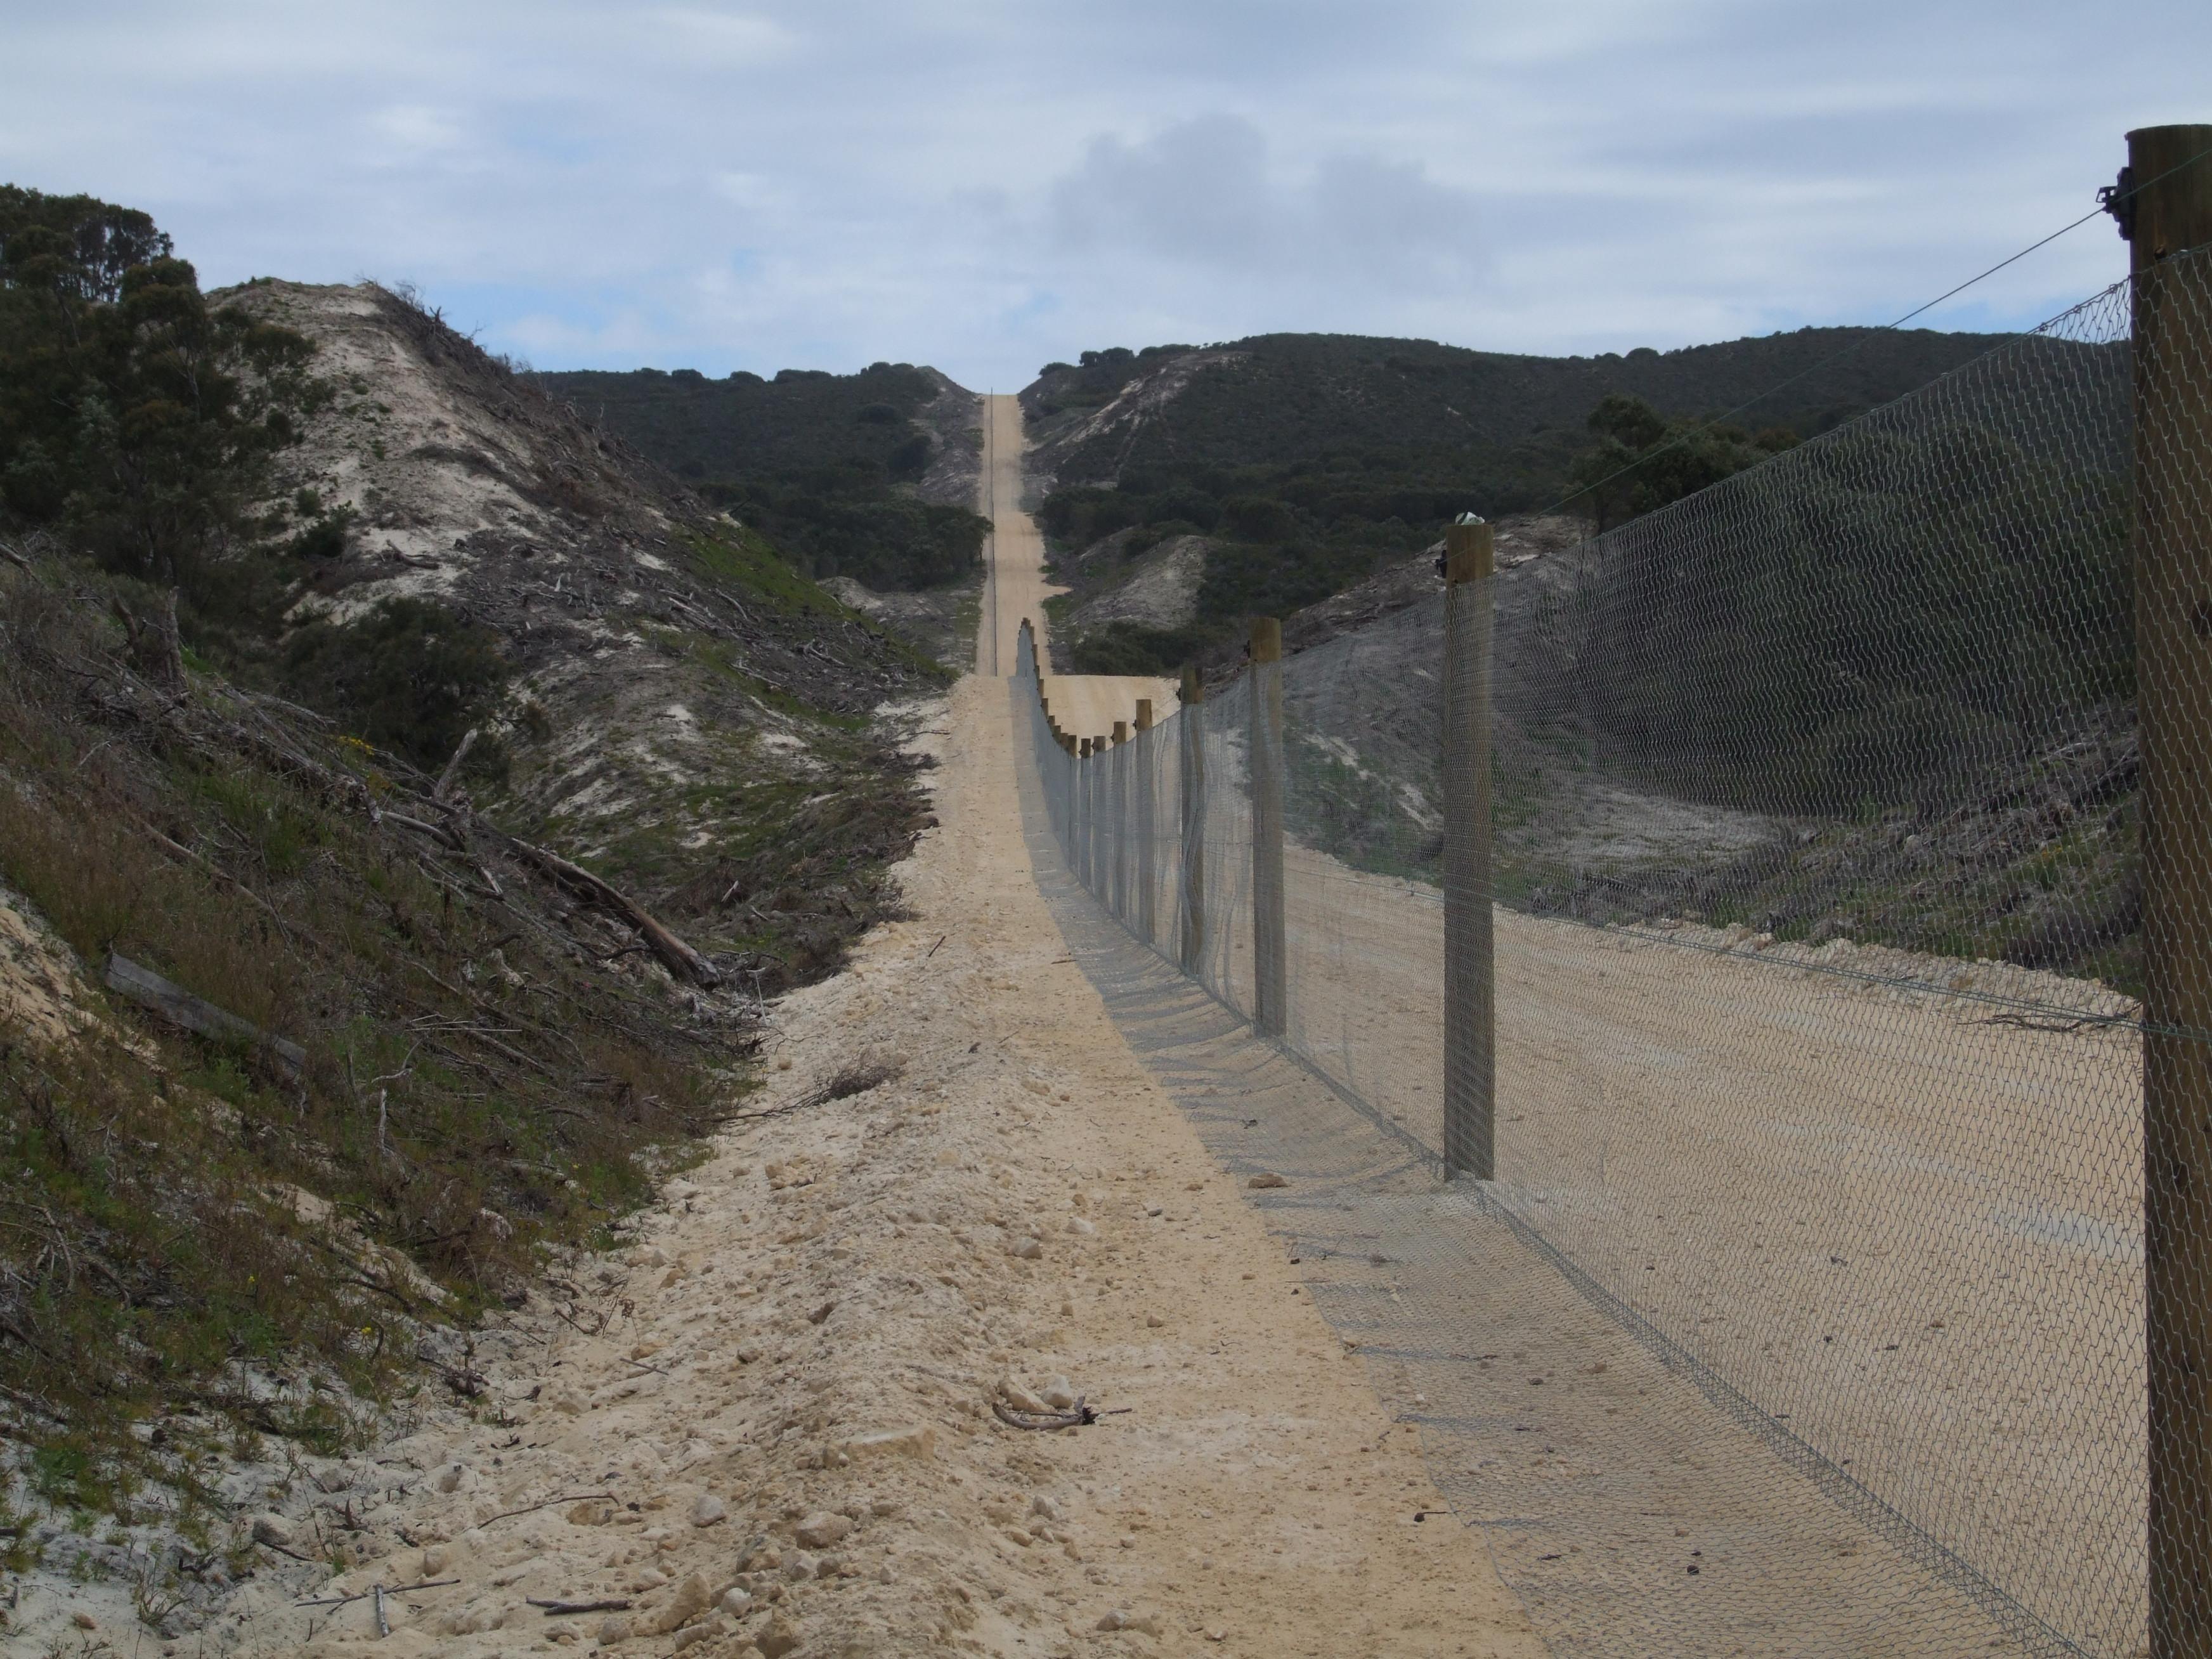 Land Surveyor - straight fences